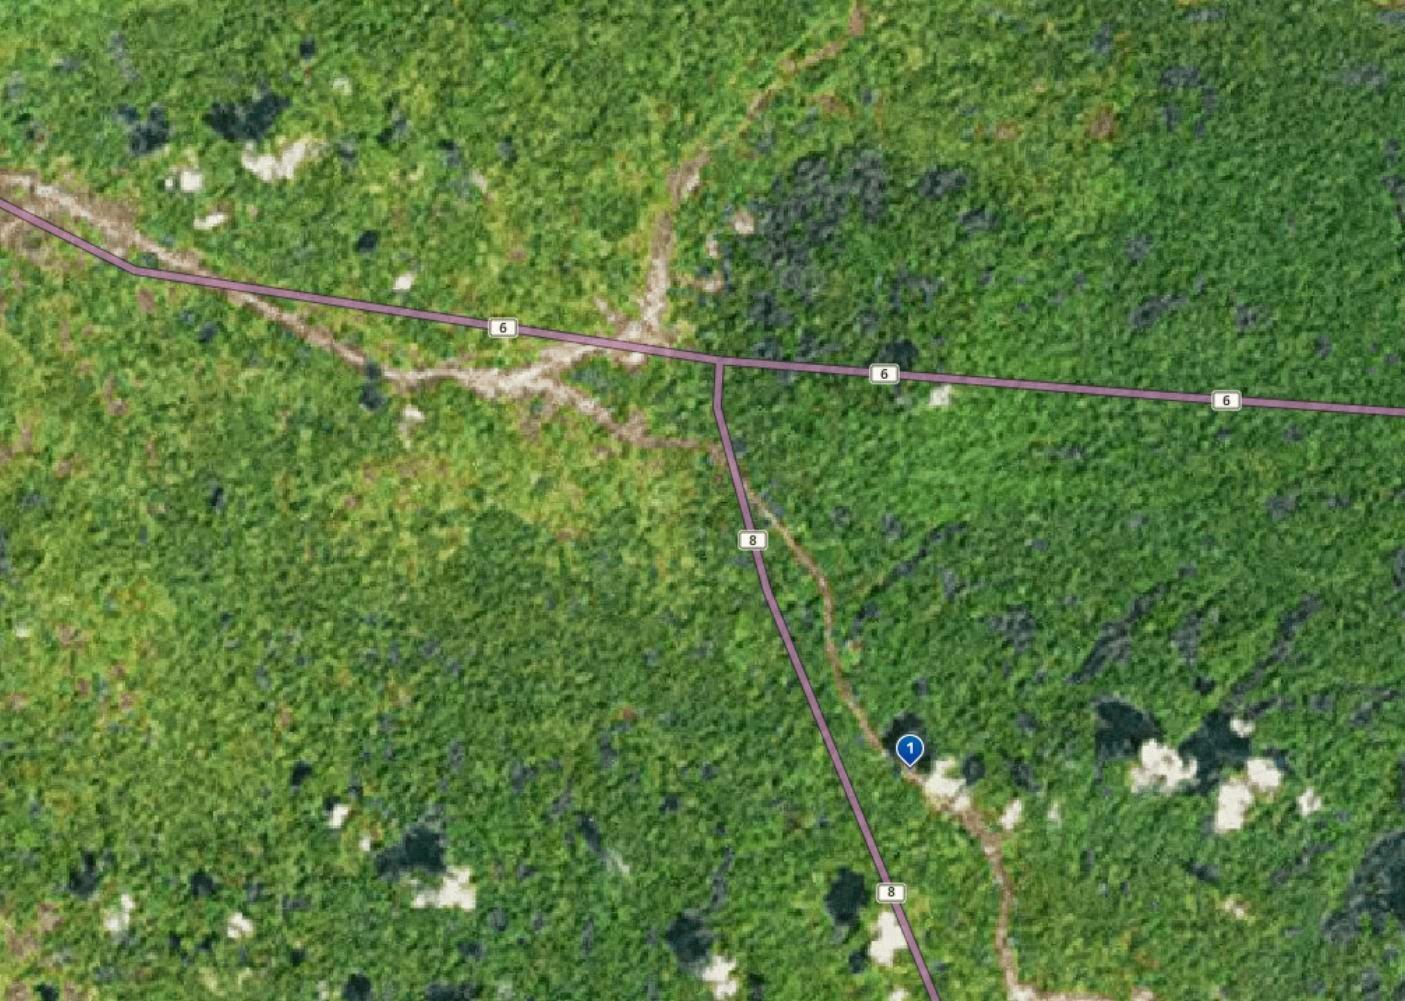 4x4tripping Bing vs Google vs OVI satellite view comparison – Bing Maps Satellite View